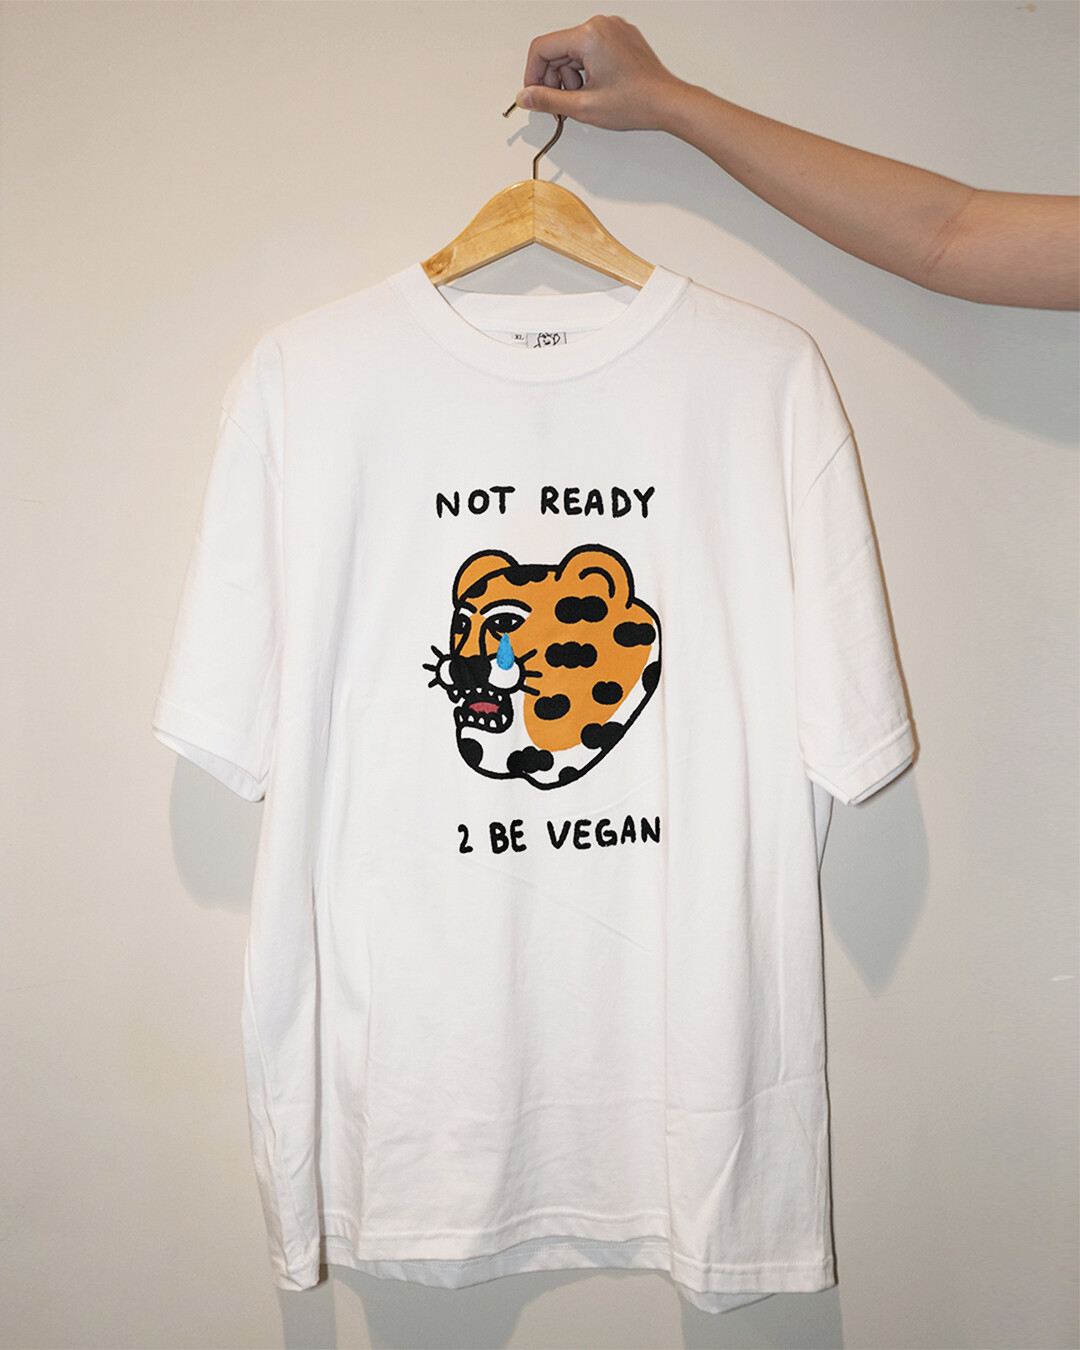 'Not Ready 2 Be Vegan' UNISEX Boxy T-shirt